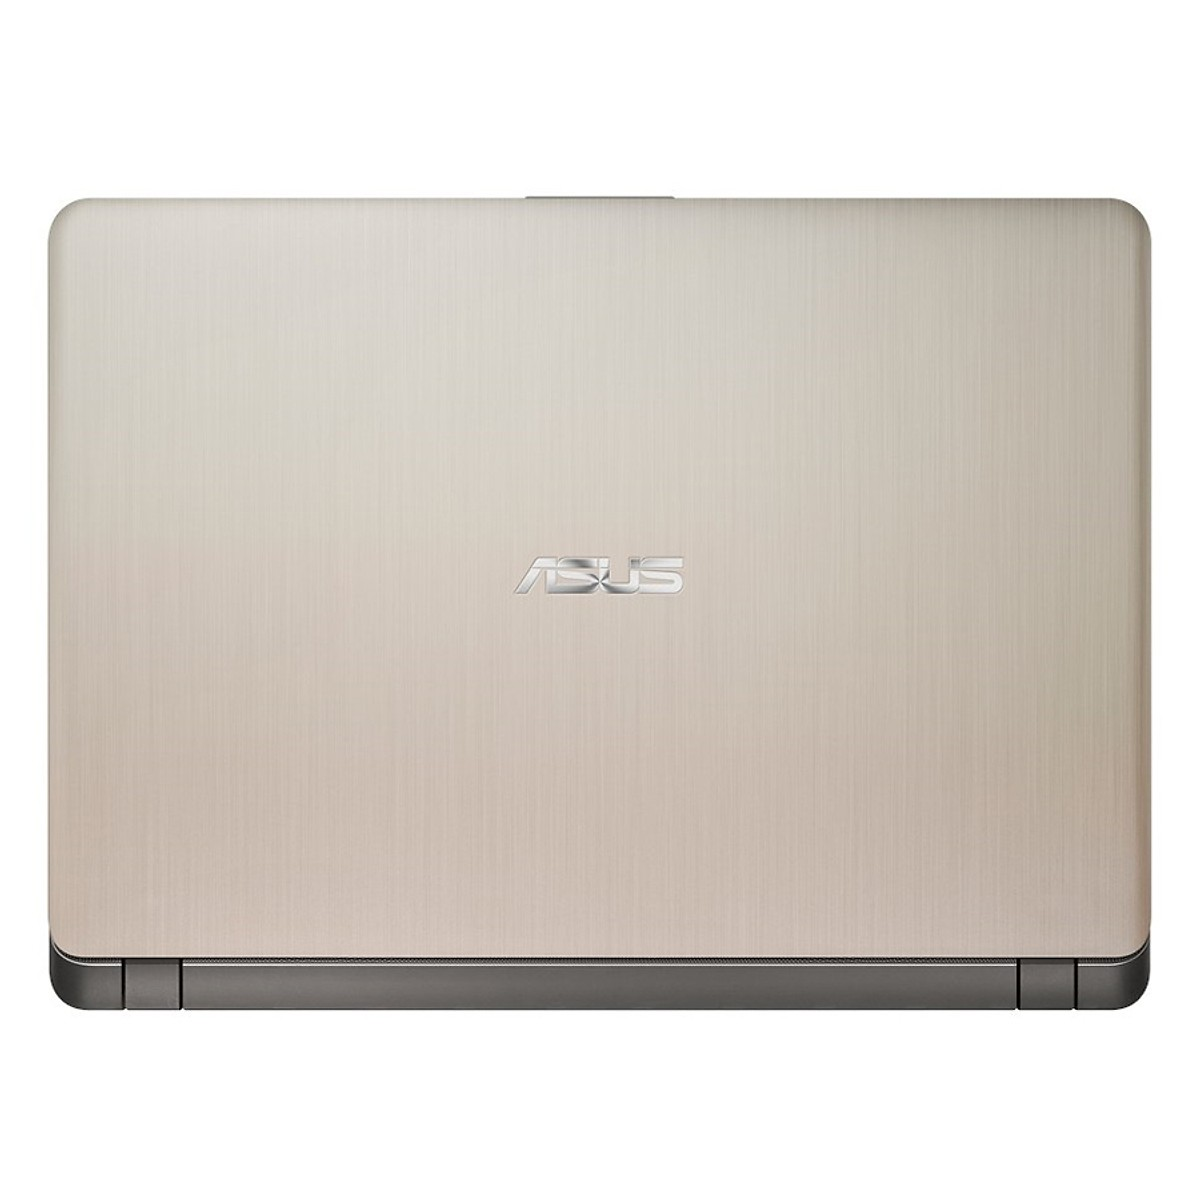 Asus   Máy tính xách tay - Laptop    Laptop Asus Vivobook X507UB-BR354T Core i7-8550U/Win10 (15.6